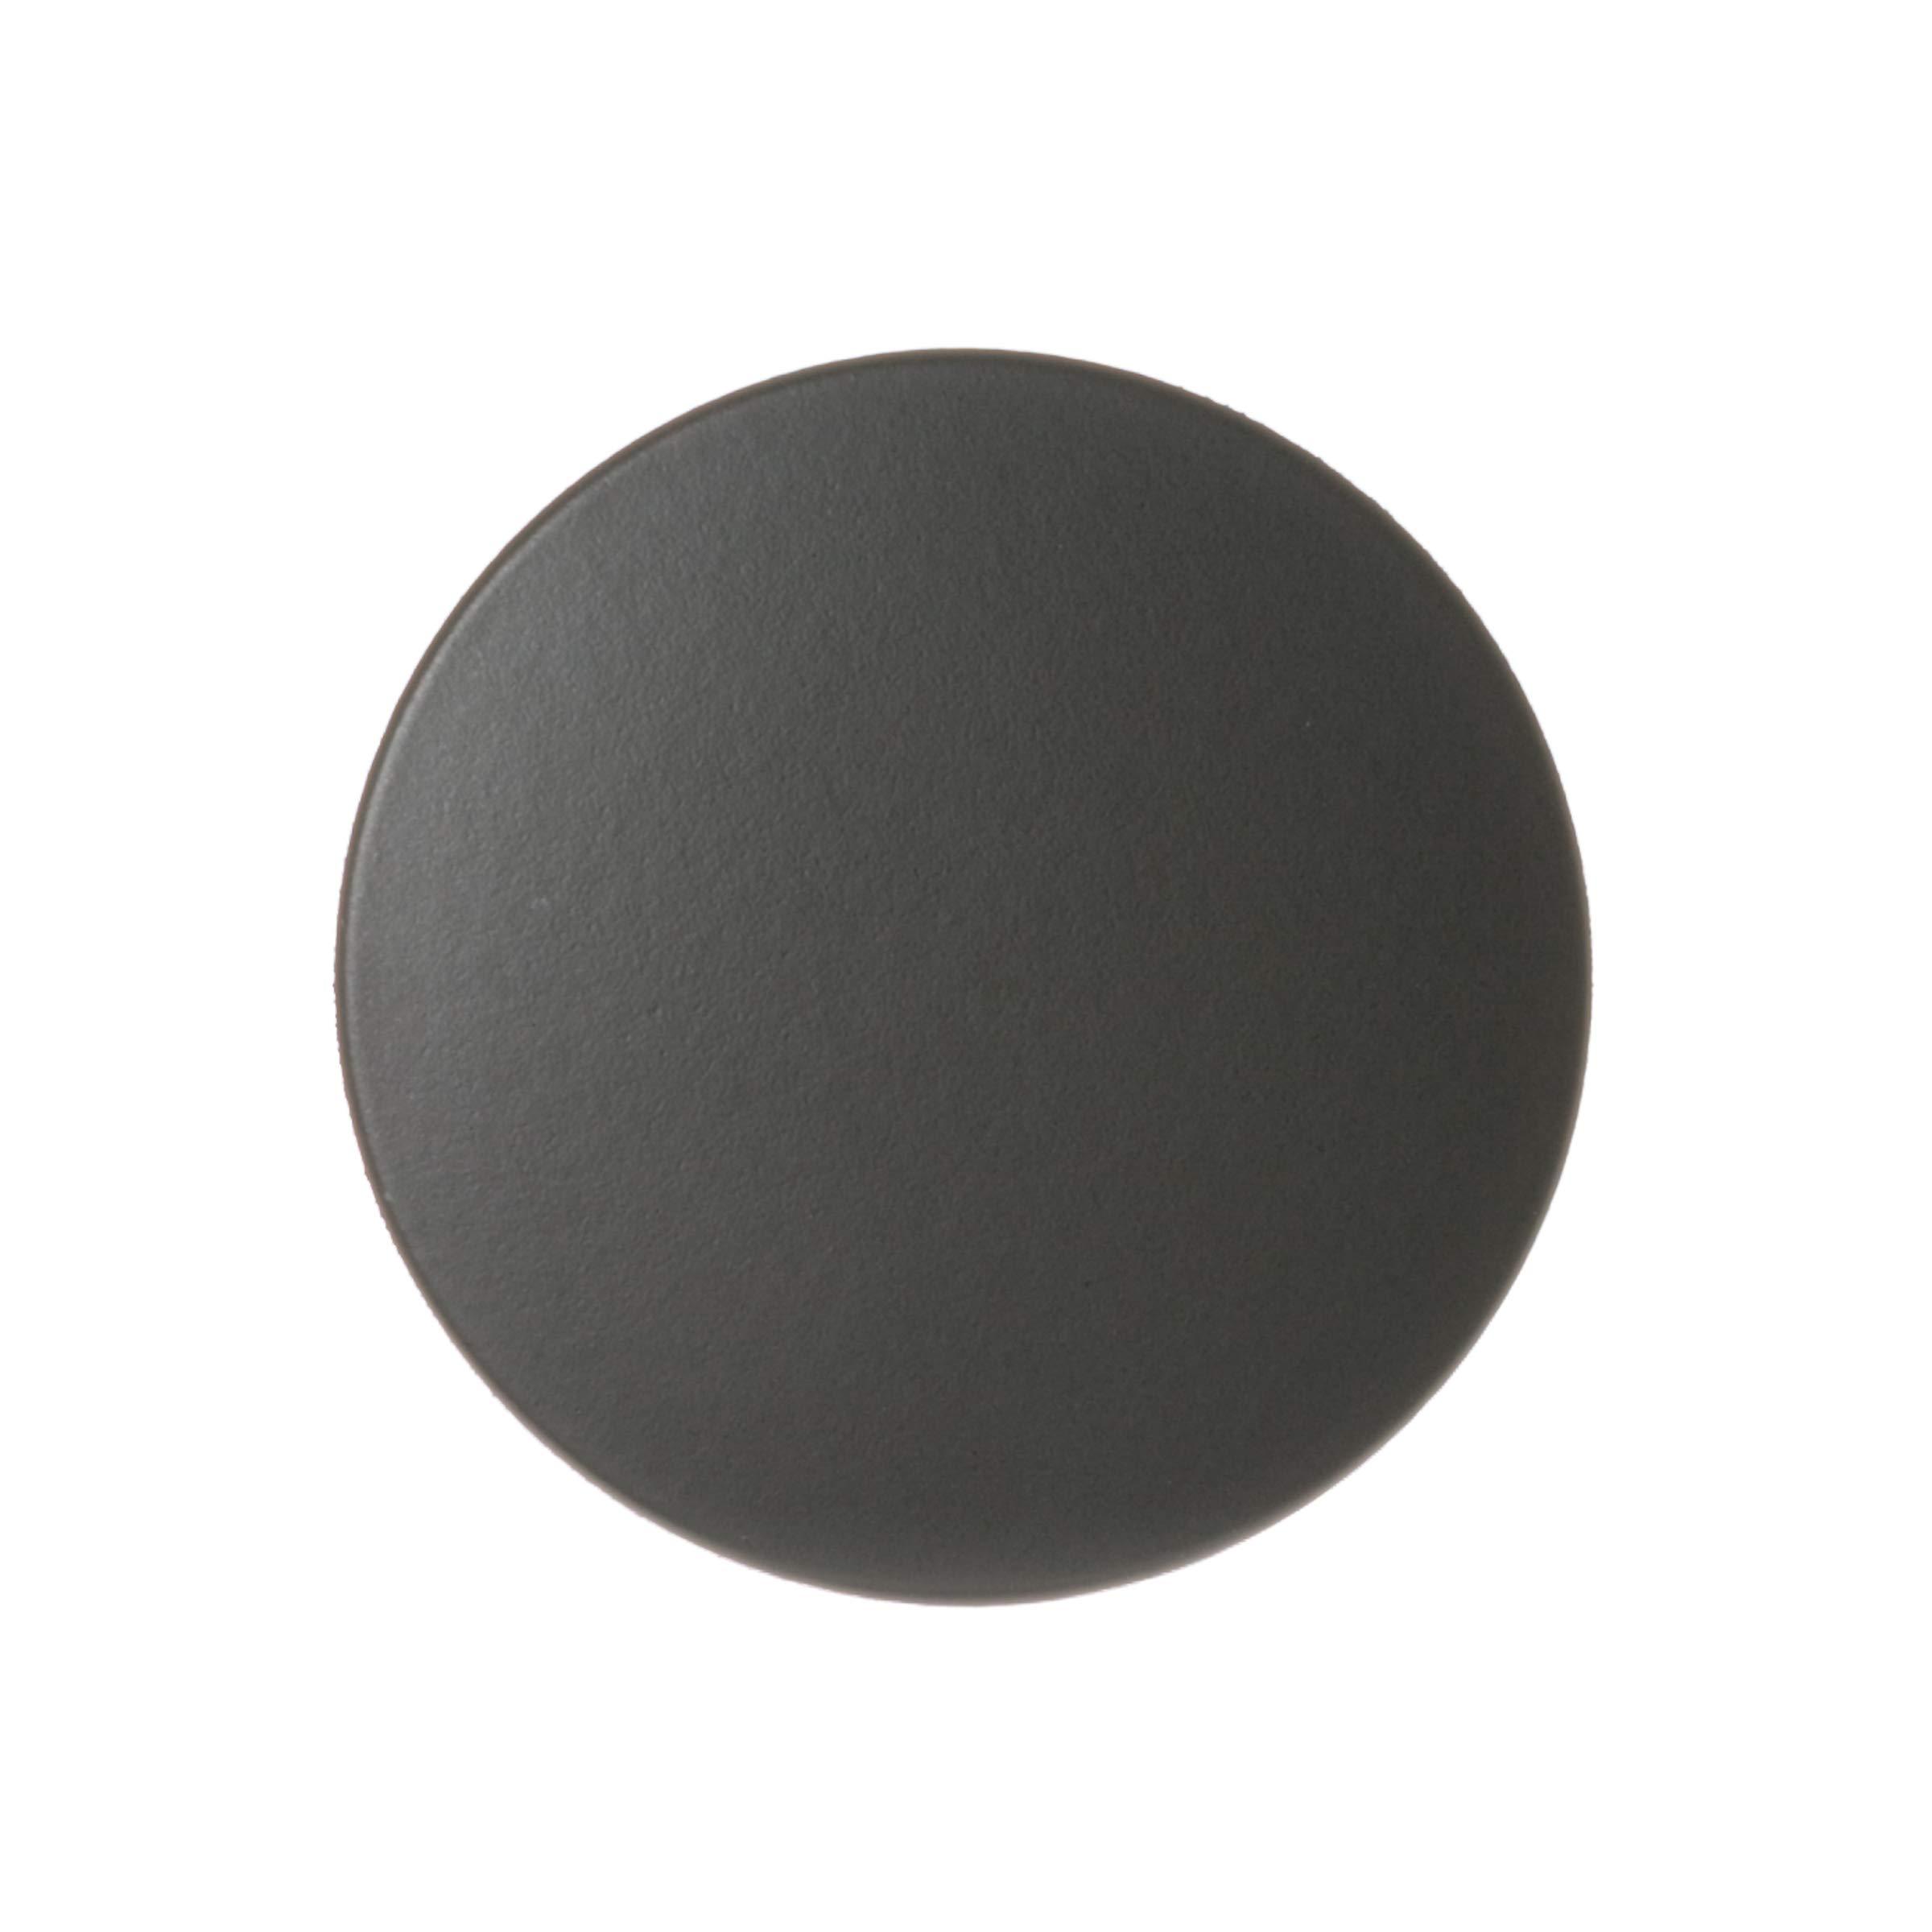 GE WB29K10024 Genuine OEM Cooktop Large Burner Cap (Black) for GE Gas Ranges